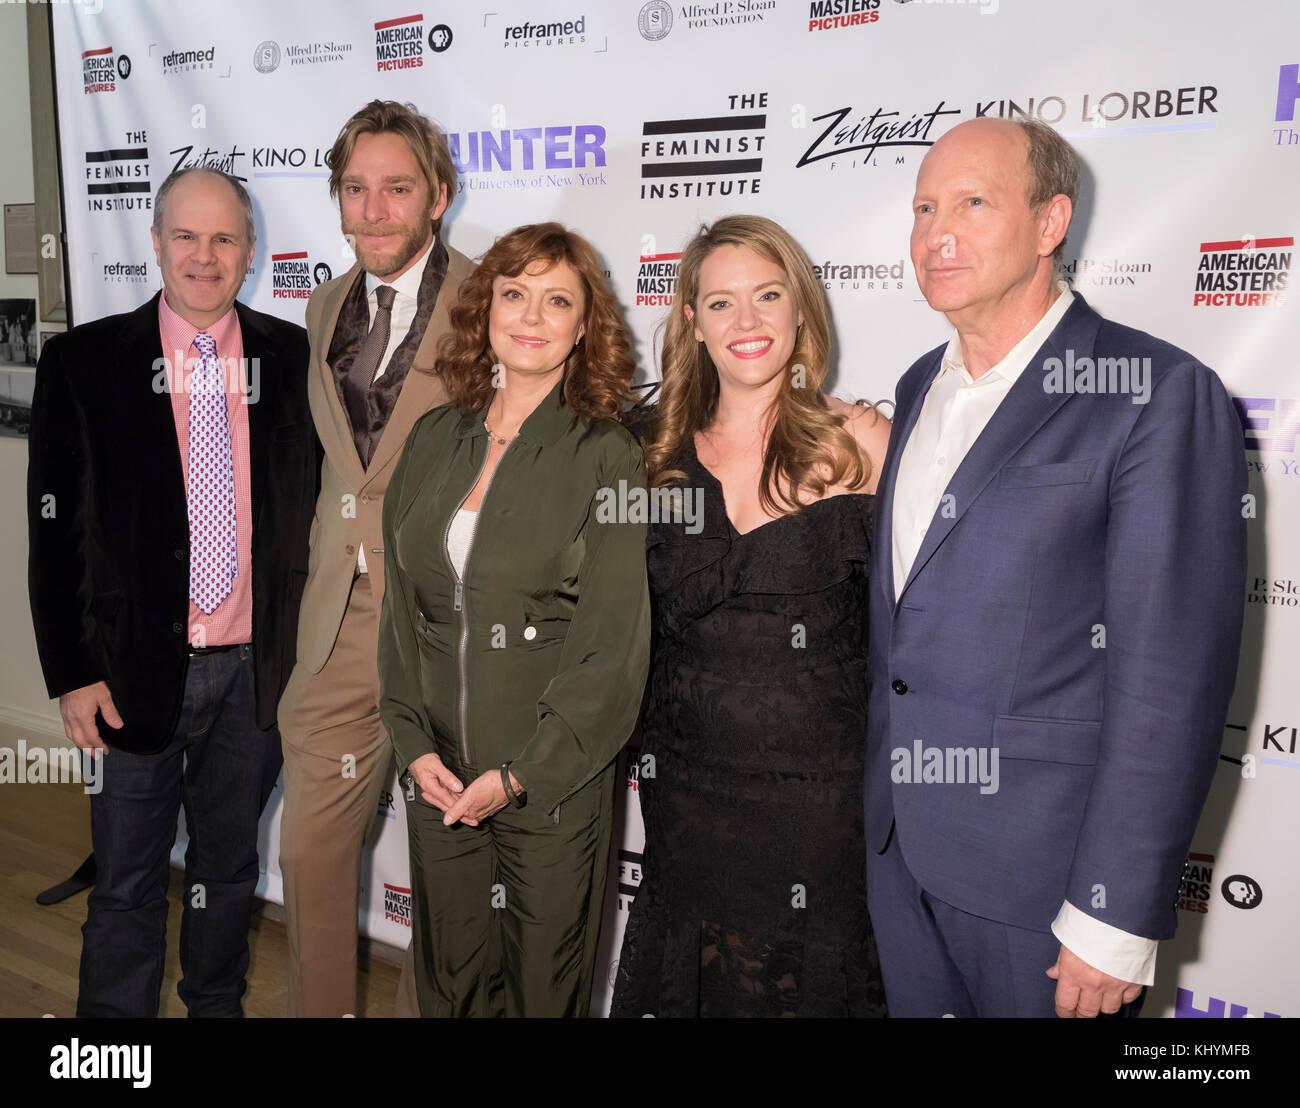 New York, USA. 20th Nov, 2017. (L-R) Michael Cantor, Adam Haggiag, Susan Sarandon, Alexandra Dean and Doron Weber - Stock Image